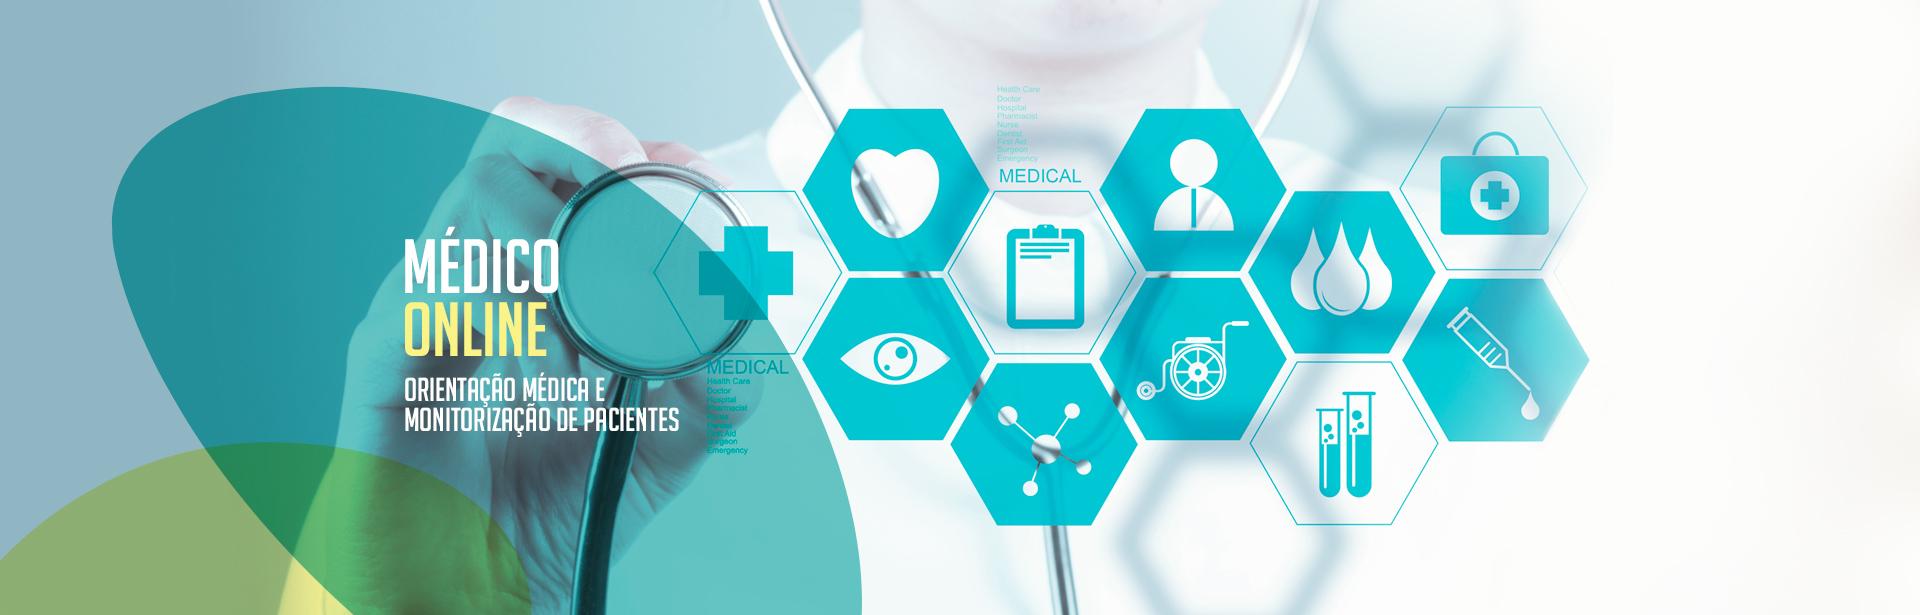 banner-medico-online